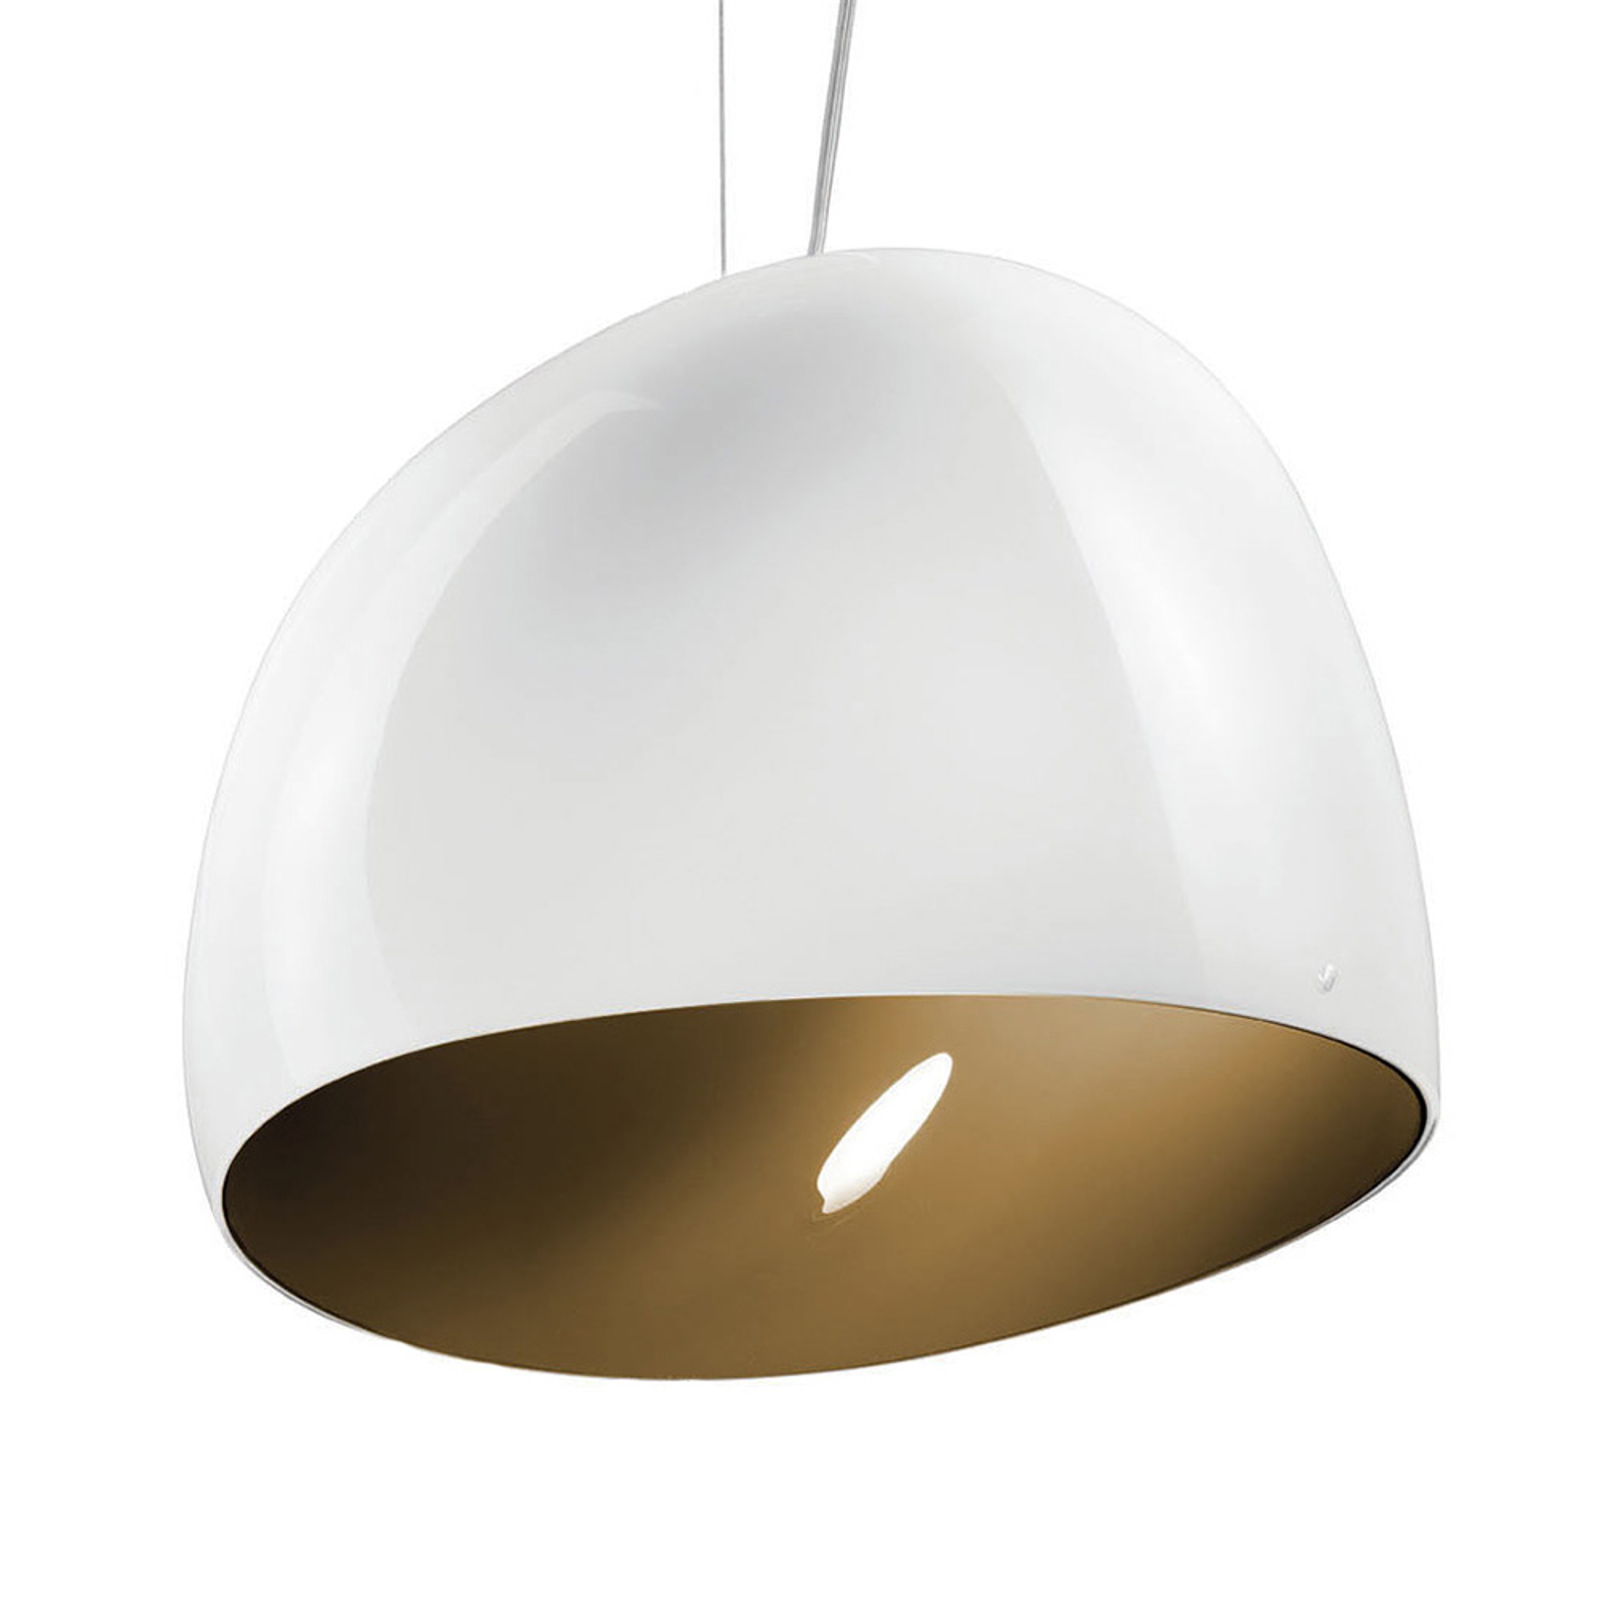 Riippuvalo Surface Ø 40 cm E27 valkoinen/ruskea